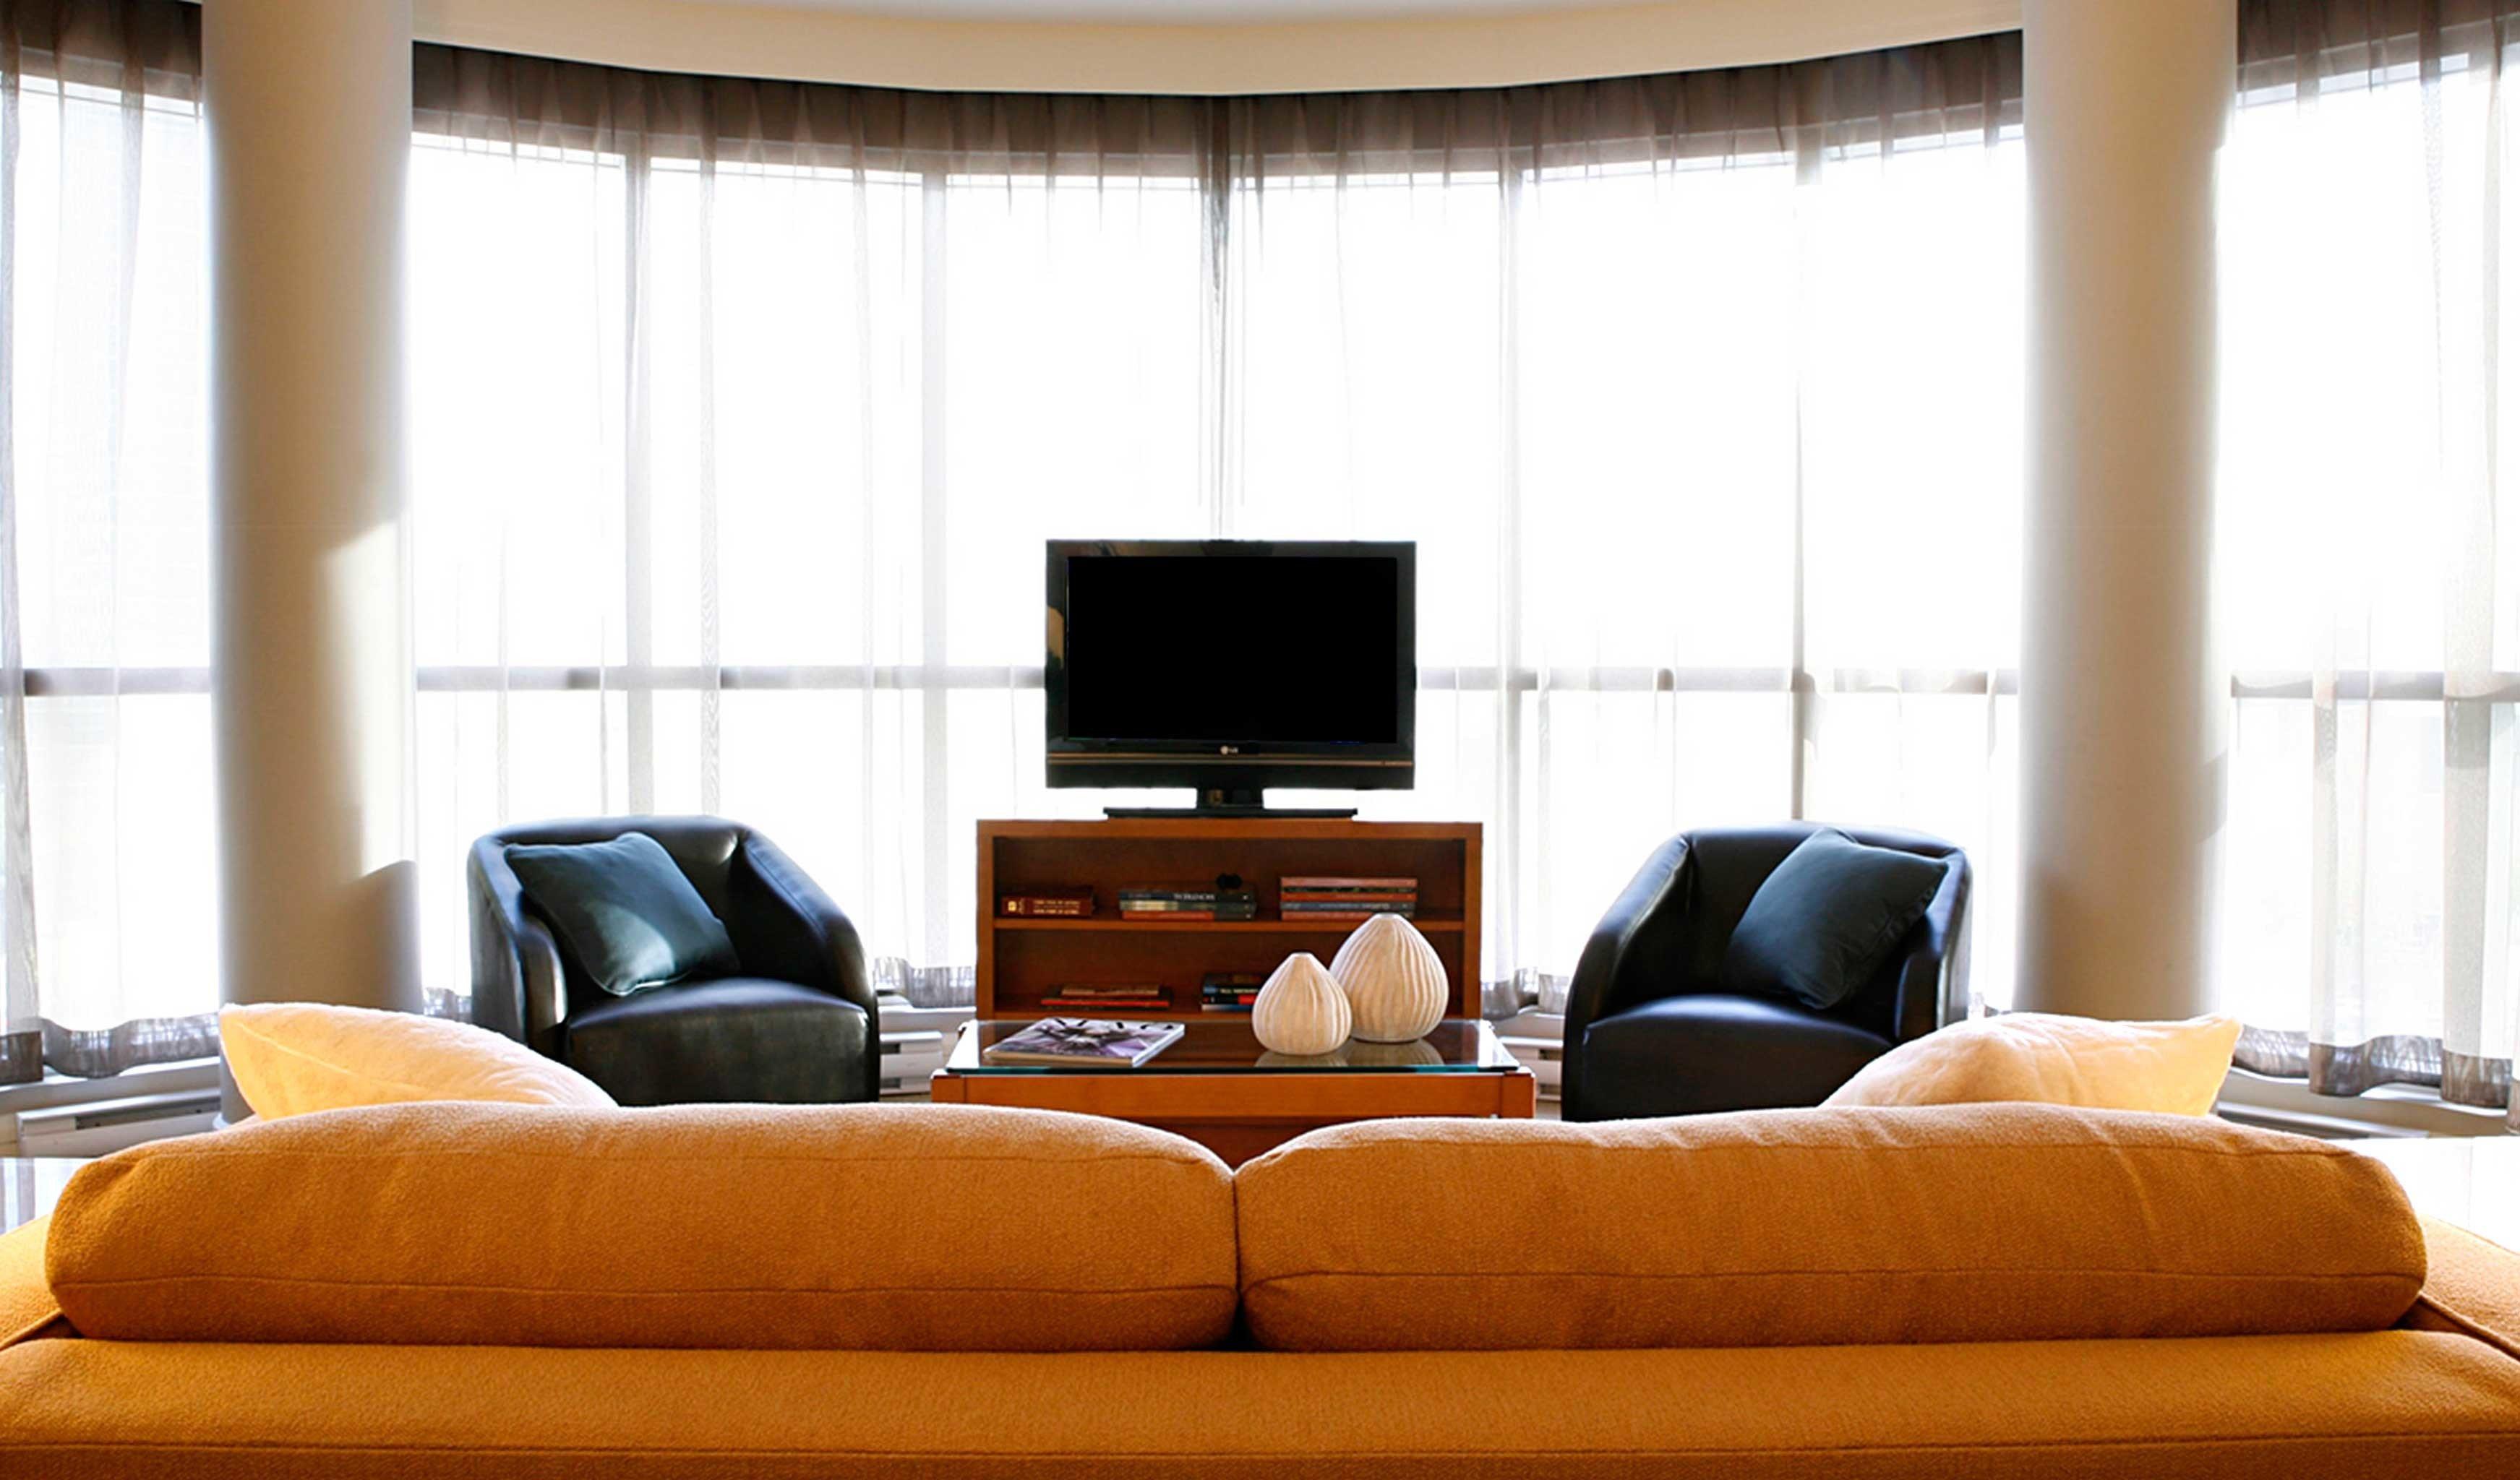 Lounge Scenic views sofa living room home textile window treatment